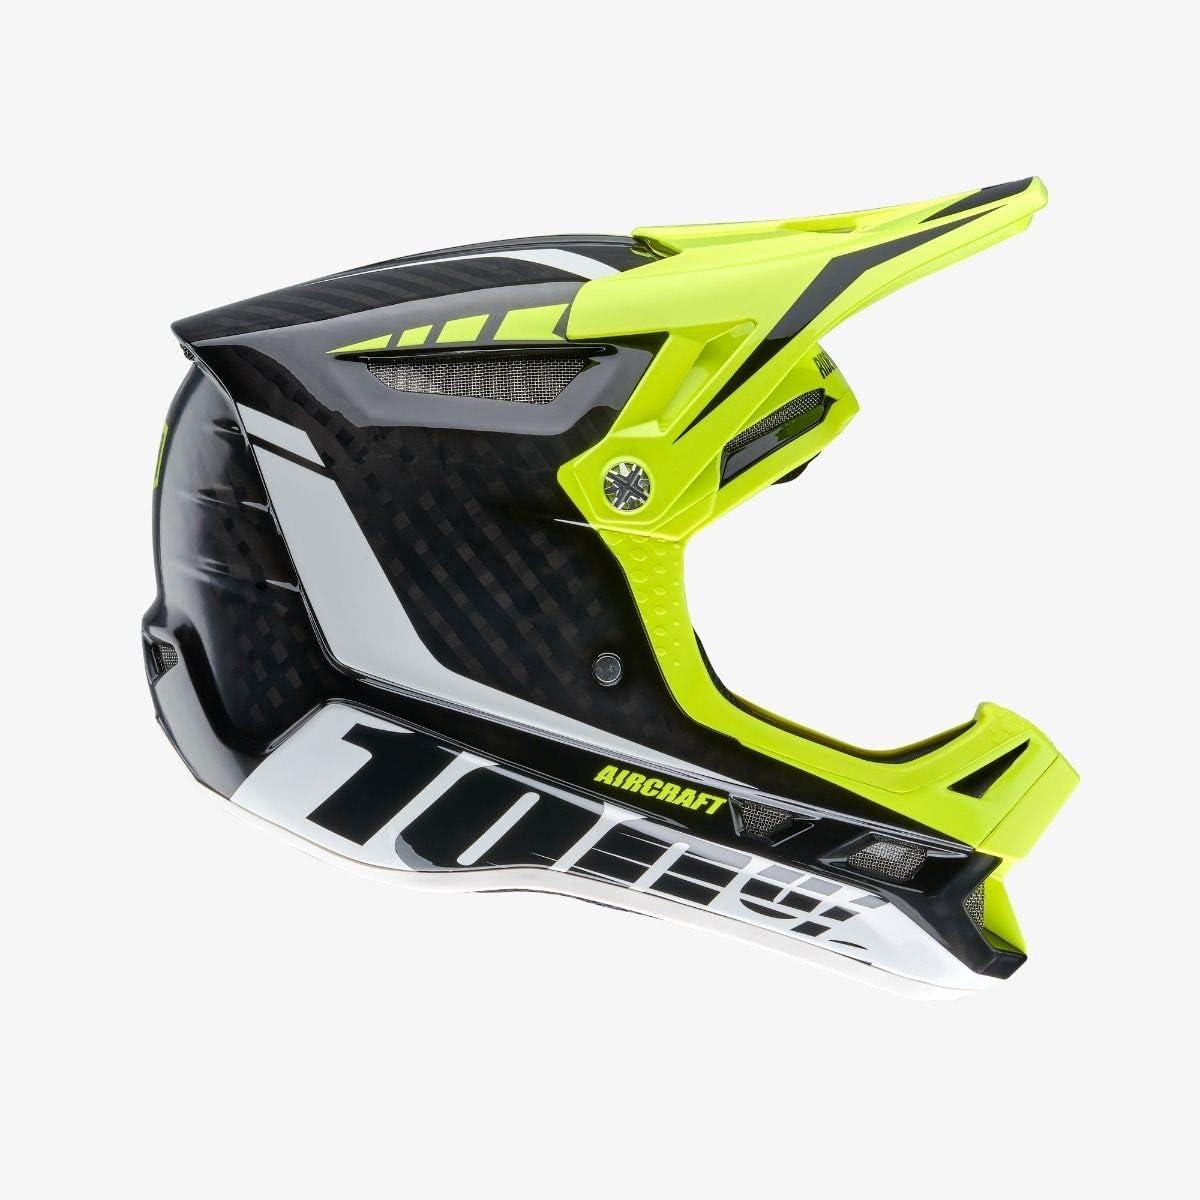 Image of 100% Aircraft DH Helmet MIPS - Demo Helmets